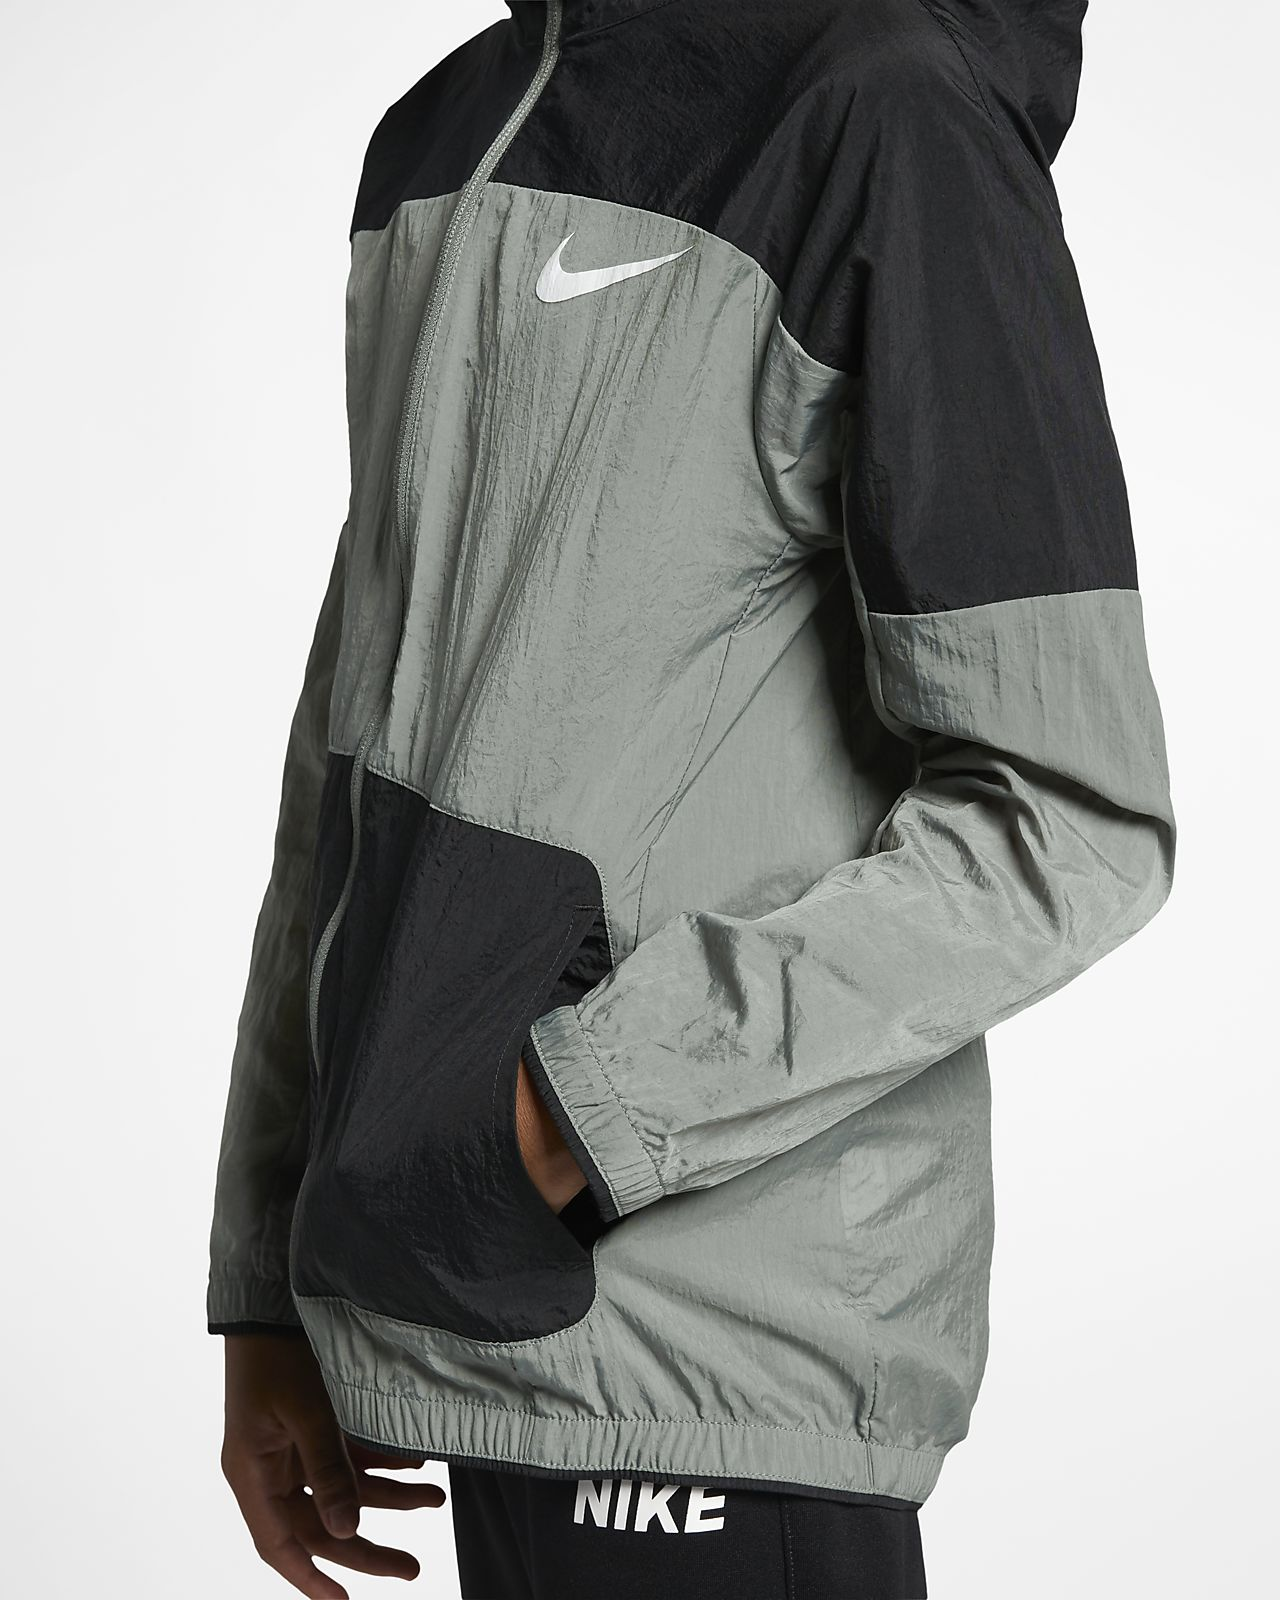 b73ac0035 Nike Dri-FIT Older Kids' Woven Training Jacket. Nike.com DK